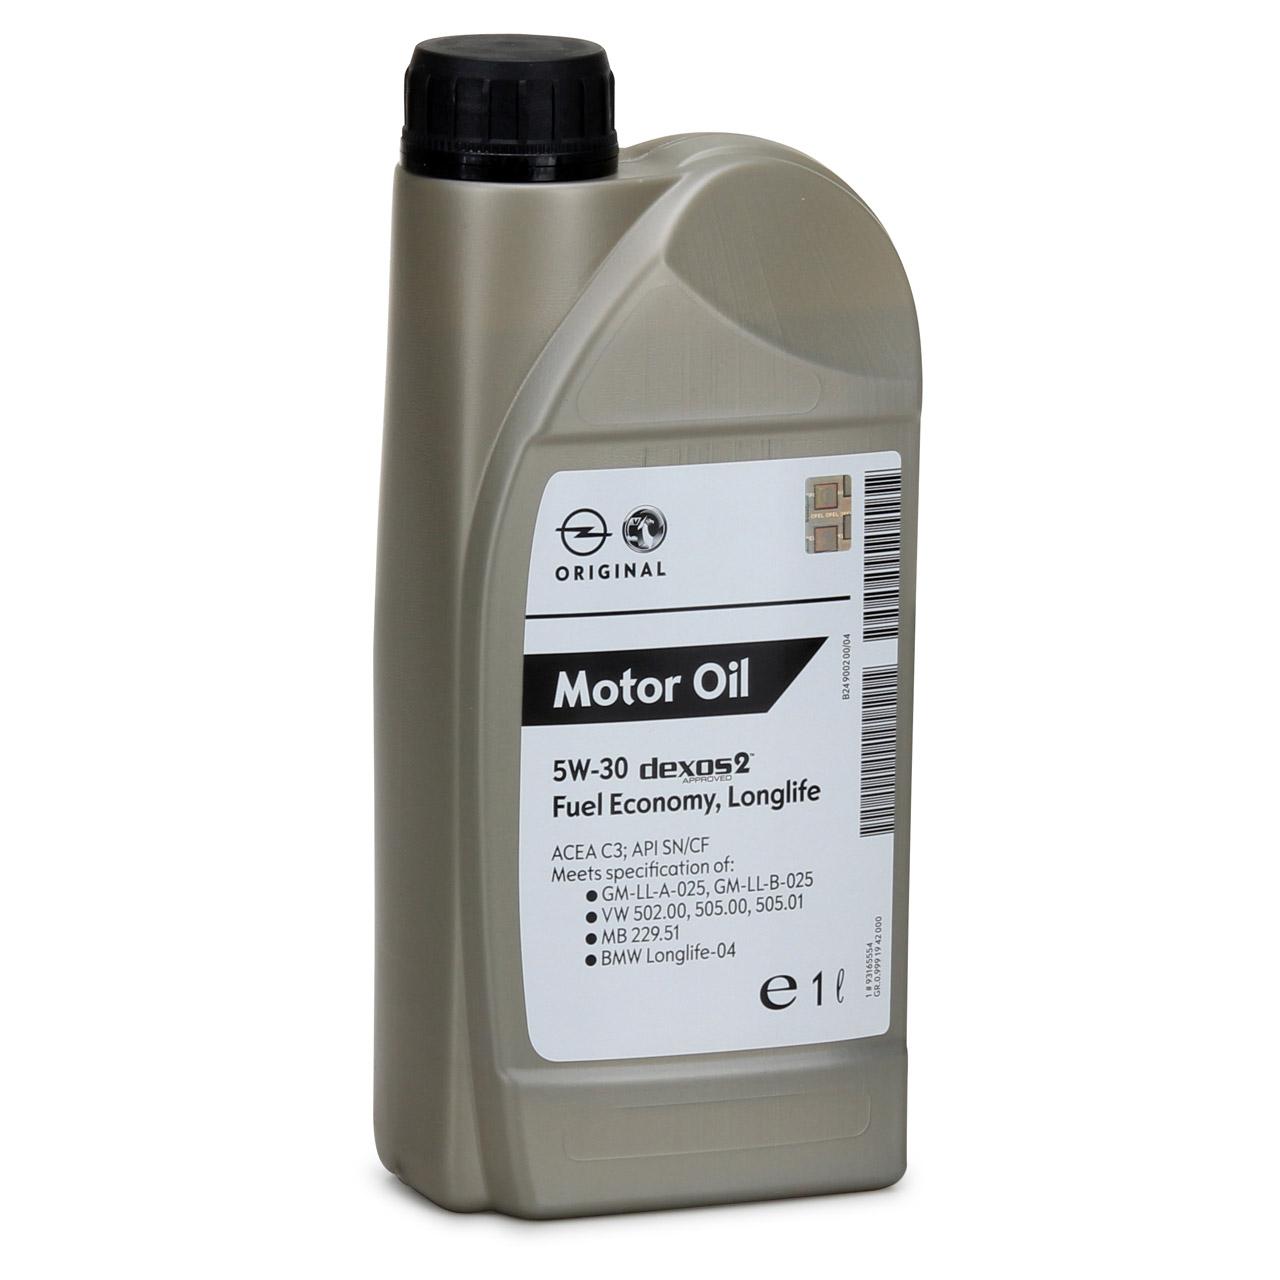 ORIGINAL Opel GM Motoröl Öl 5W30 Dexos2 LongLife 1 Liter 1942000